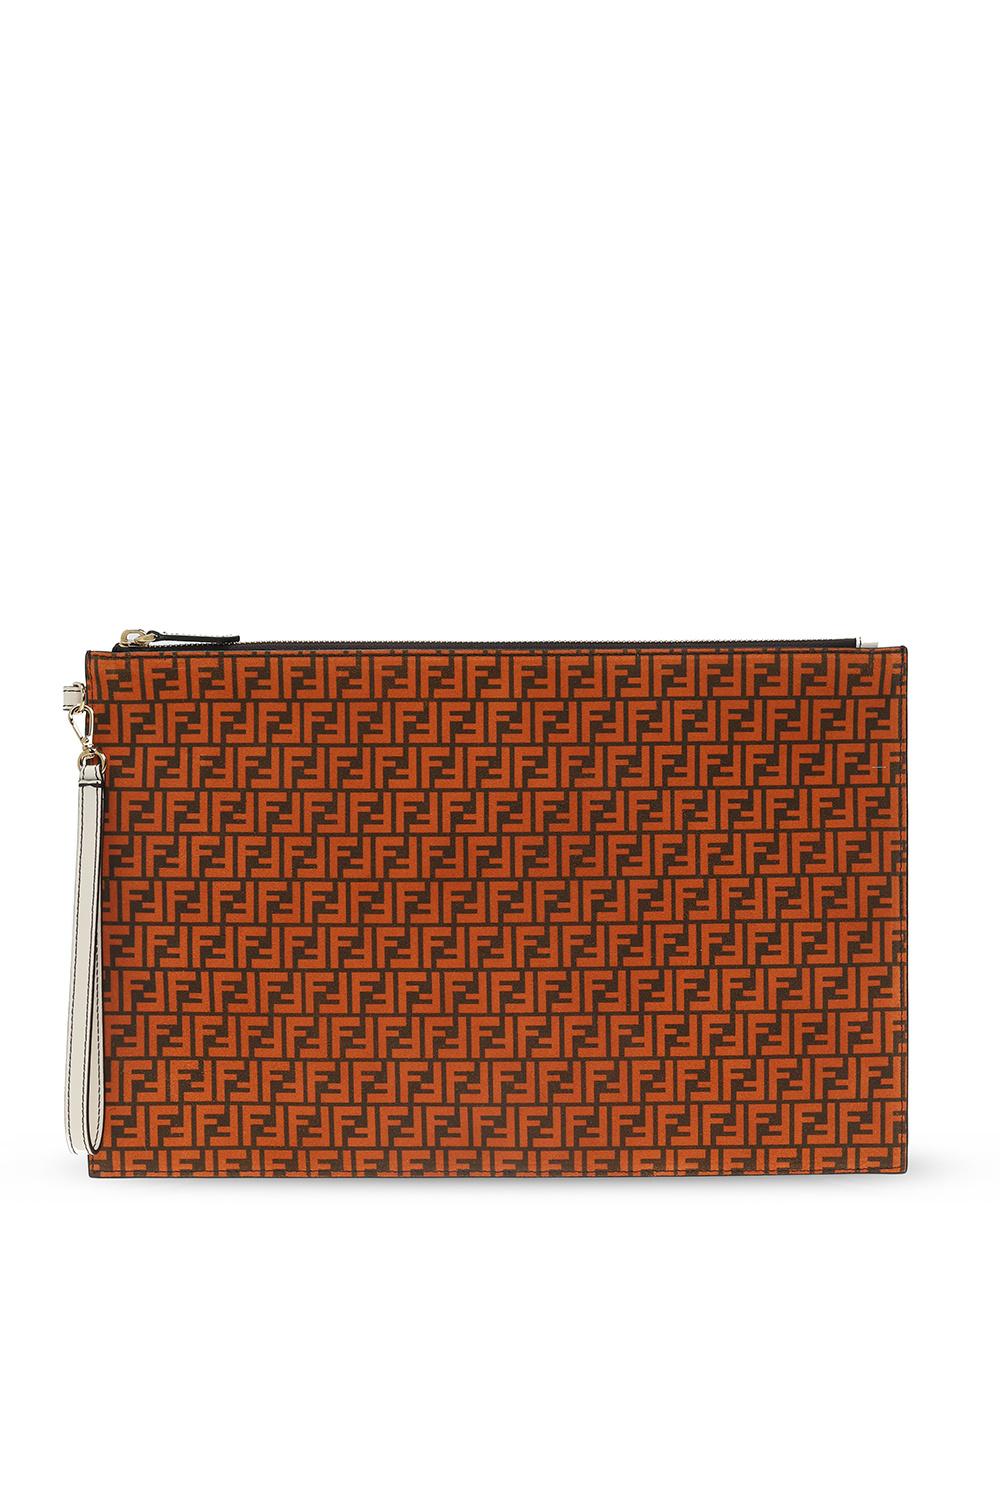 Fendi Handbag with logo